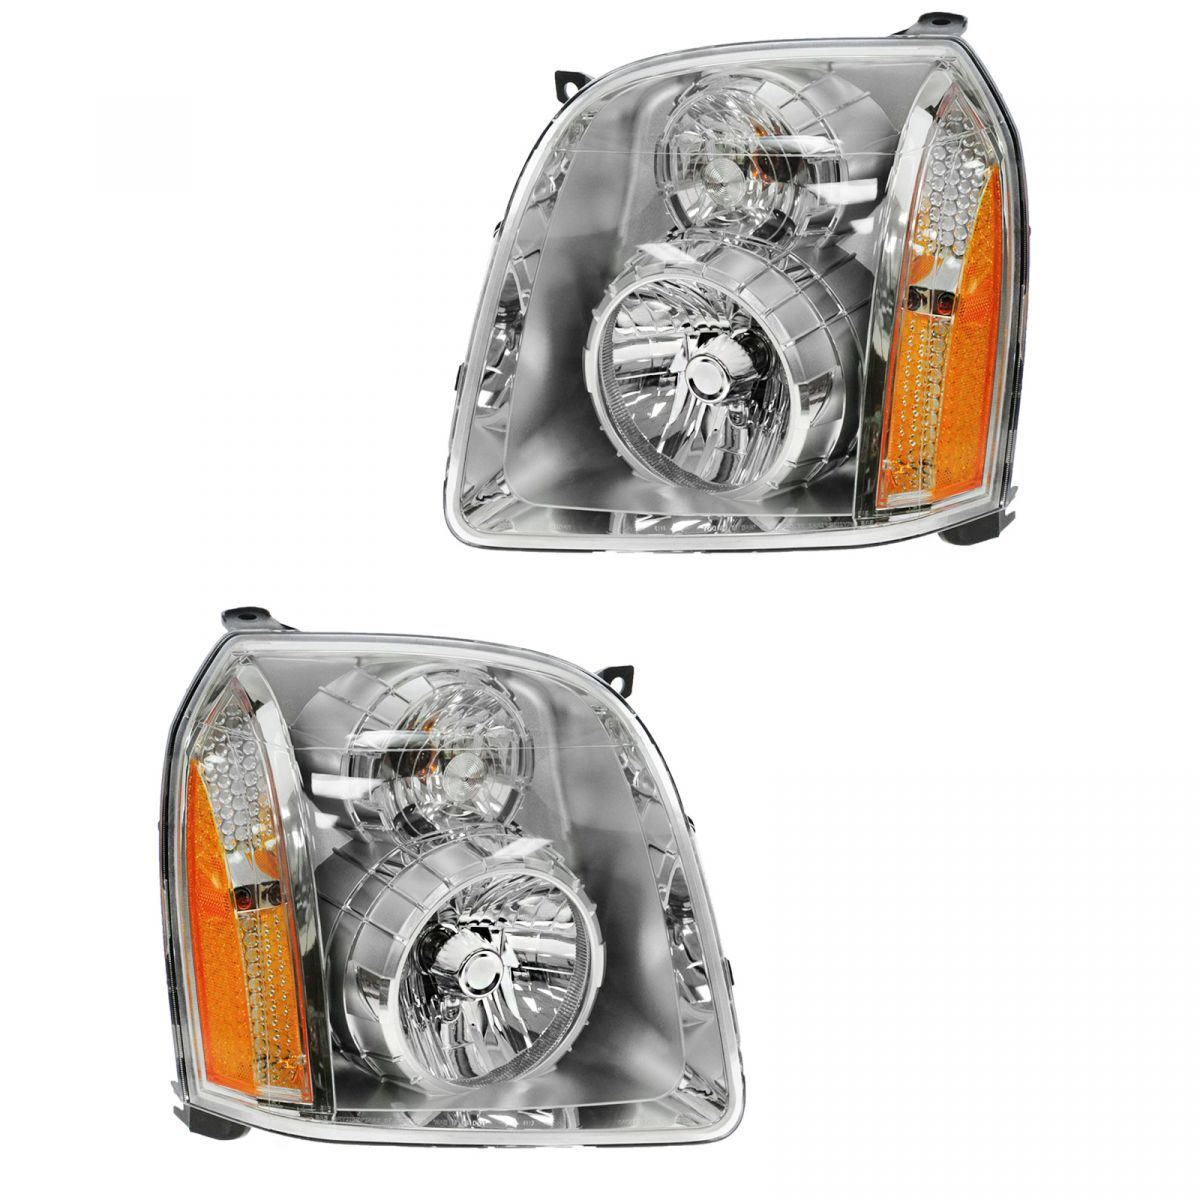 Headlights Headlamps Left & Right Lamp Pair Set of 2 for 07-13 GMC Yukon Denali